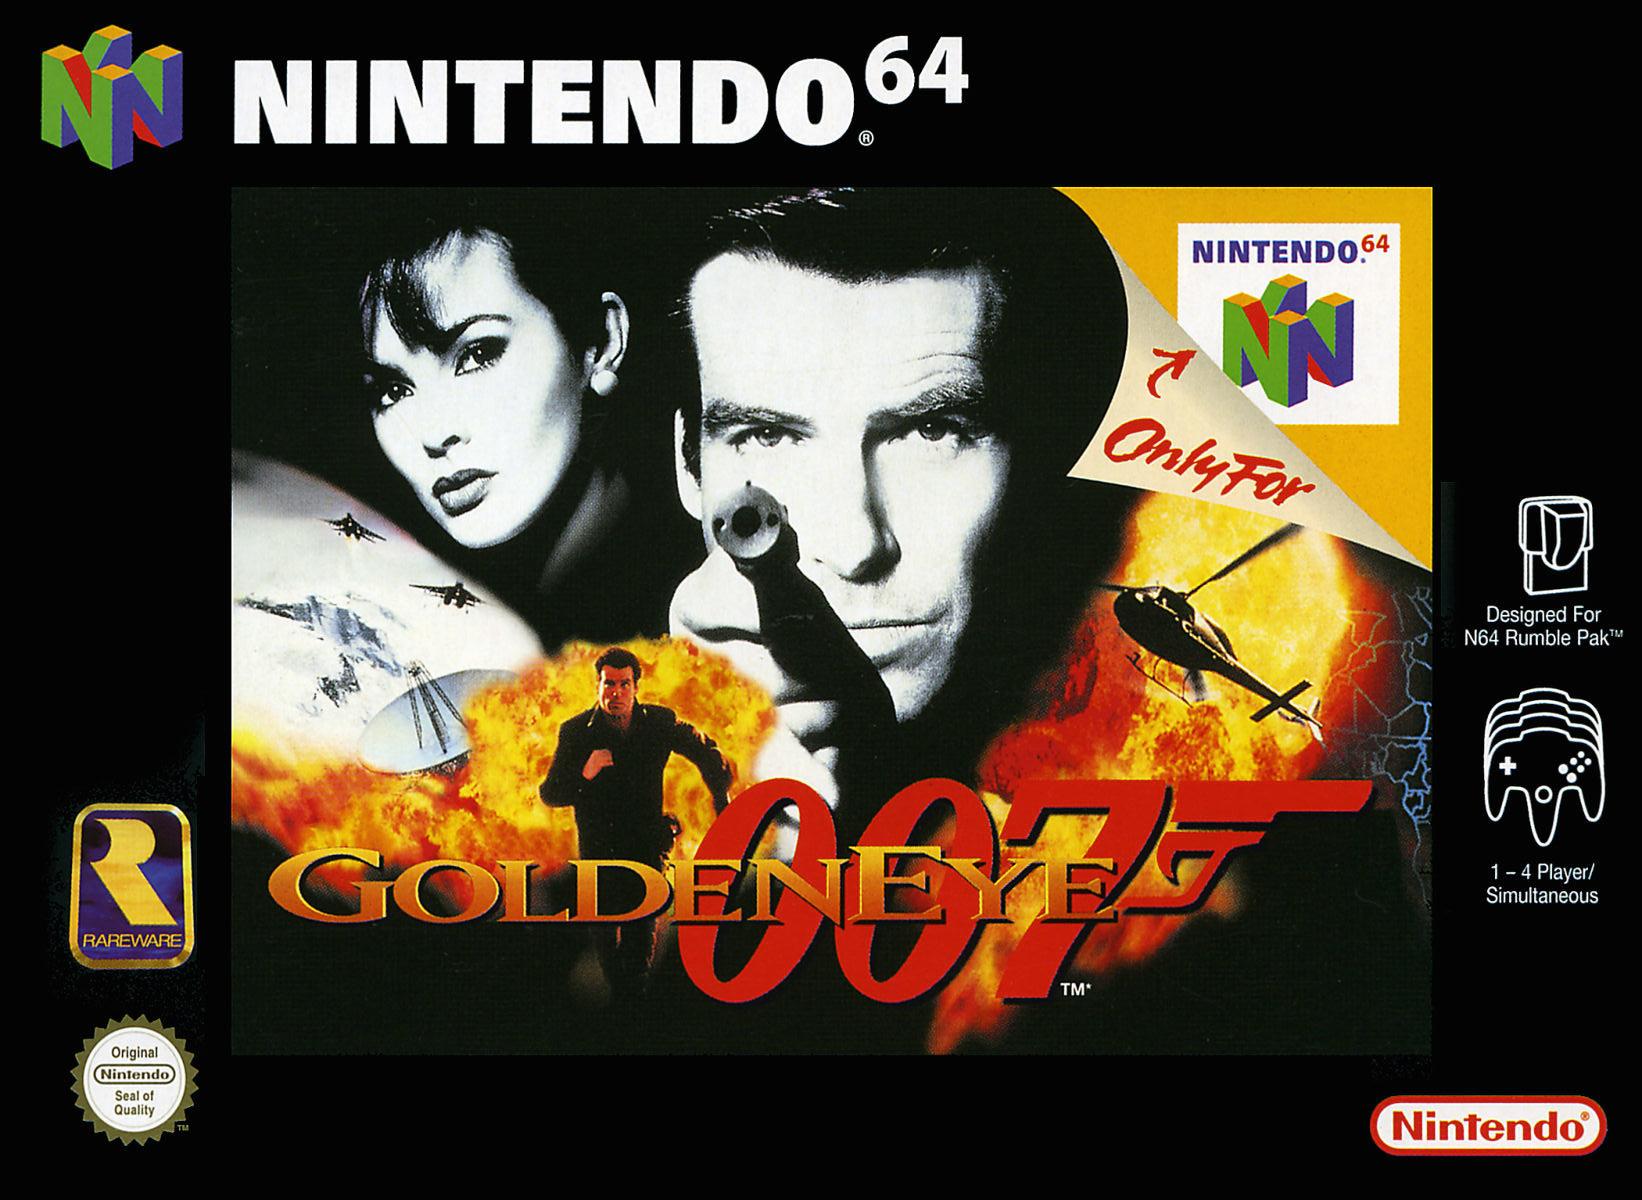 Goldeneye 007 - N64